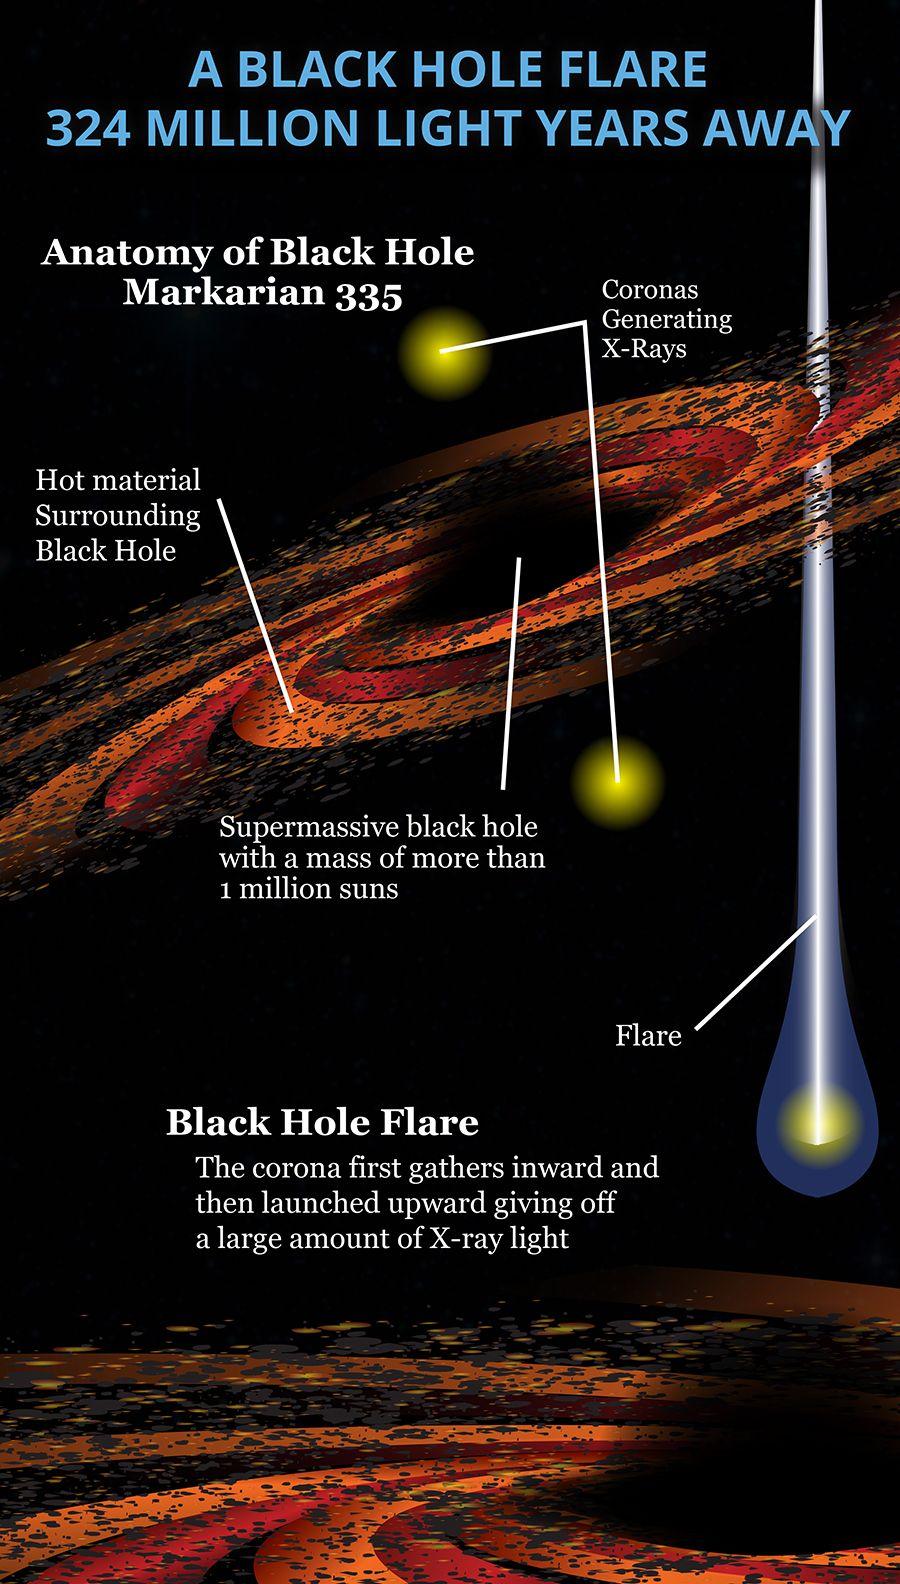 NASA Spots a Black Hole Flare 324 Million Light Years Away ...